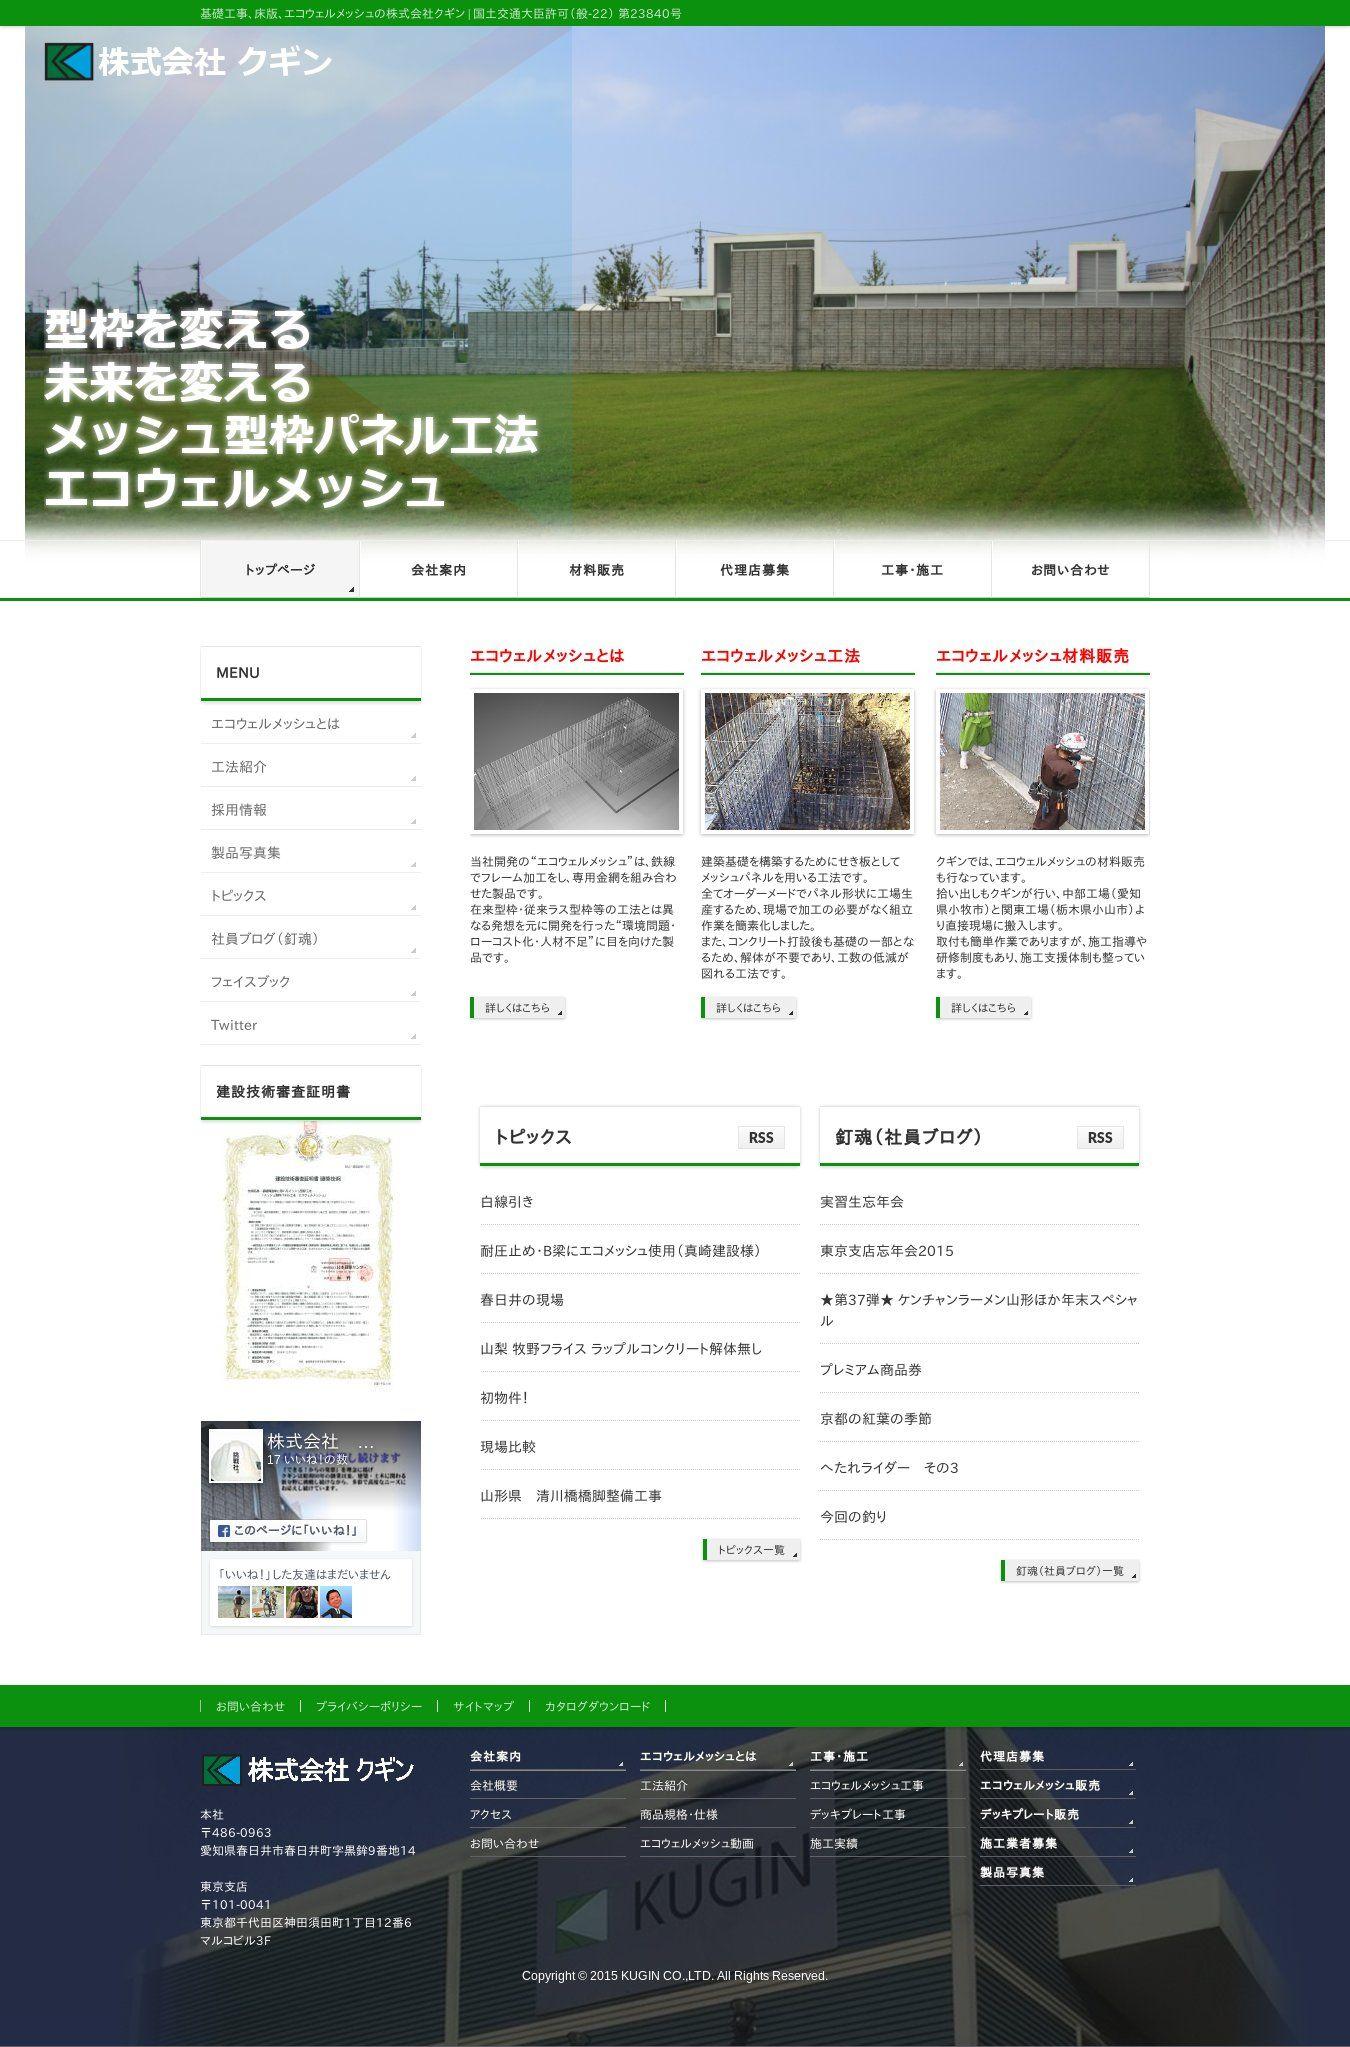 biz vektor child best wordpress theme by vektor inc kugin co jp wordpress theme best wordpress themes wordpress